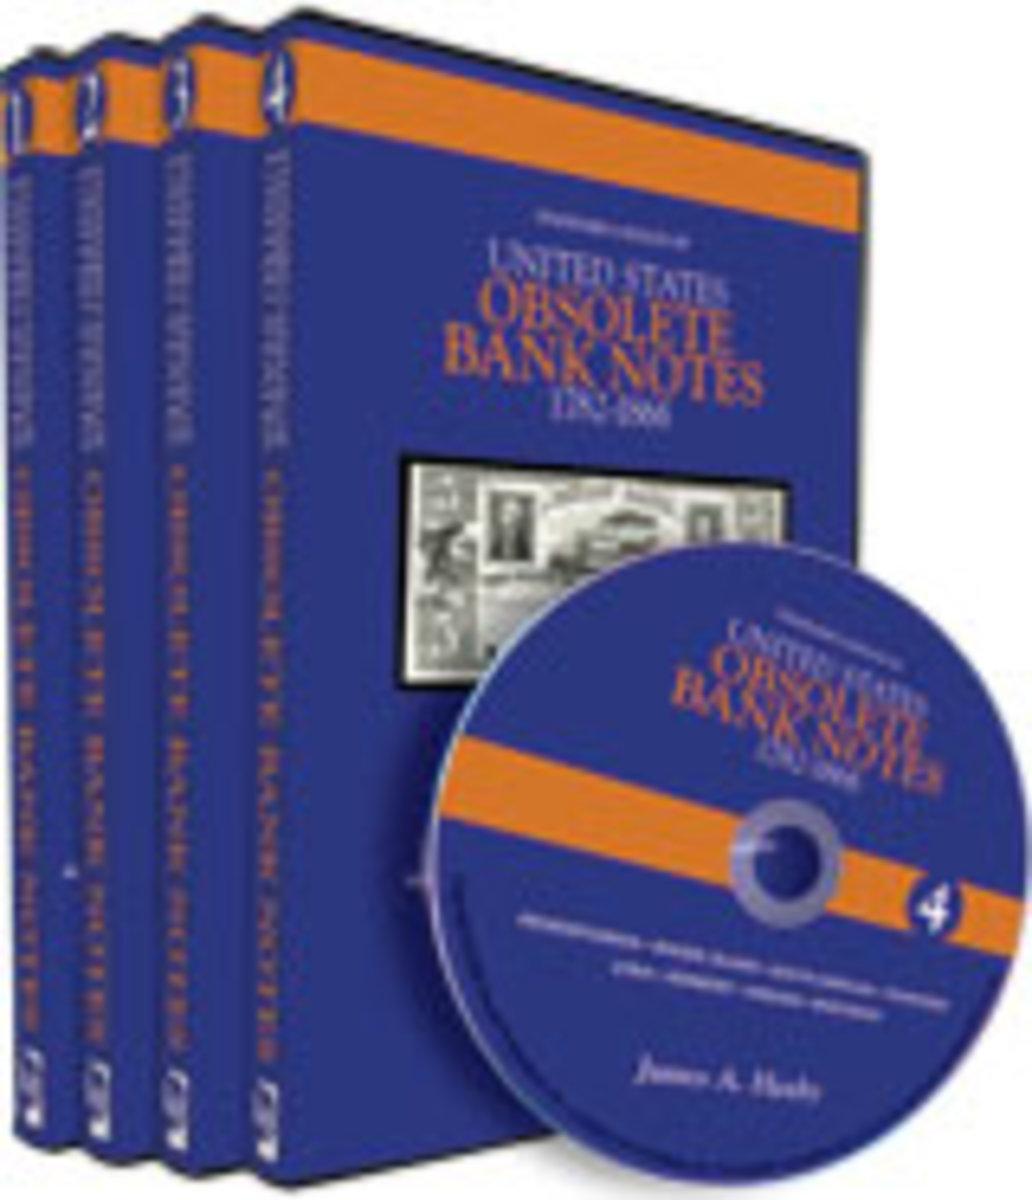 Standard Catalog of United States Obsolete Bank Notes 4-CD Set